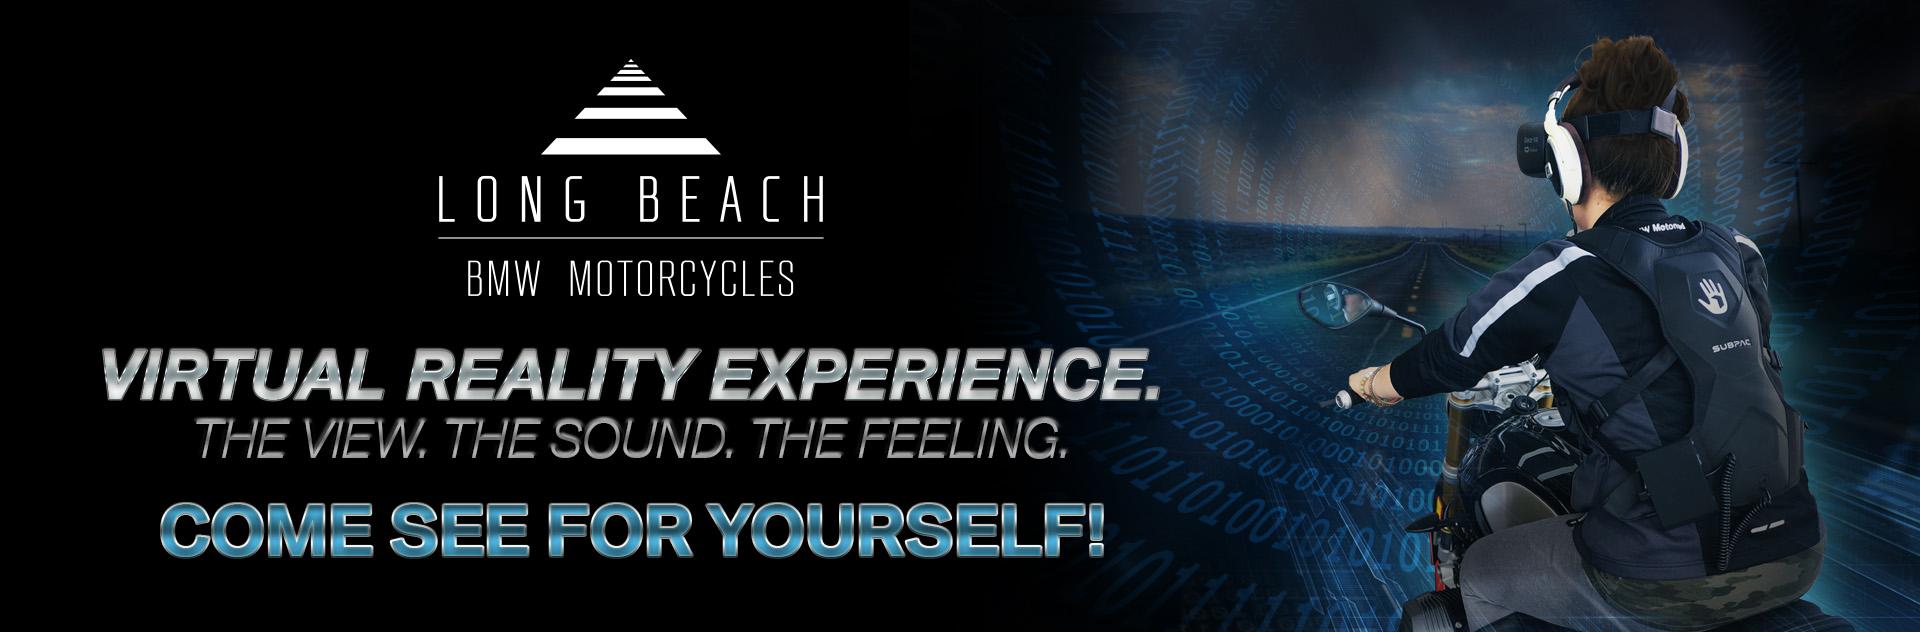 vrexperience | long beach bmw motorcycles california